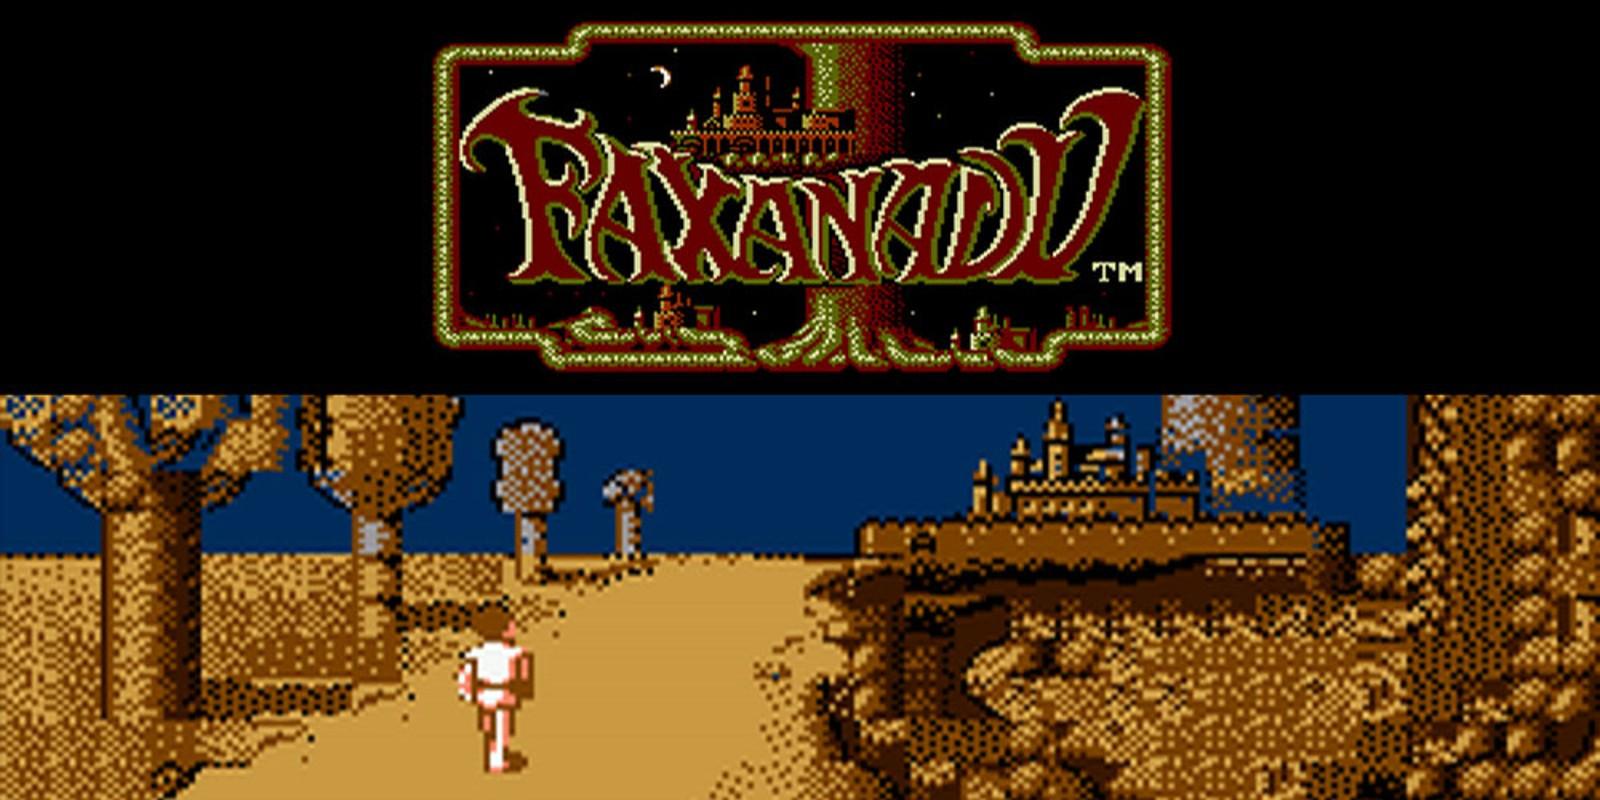 Faxanadu Virtual Console Wii Games Nintendo